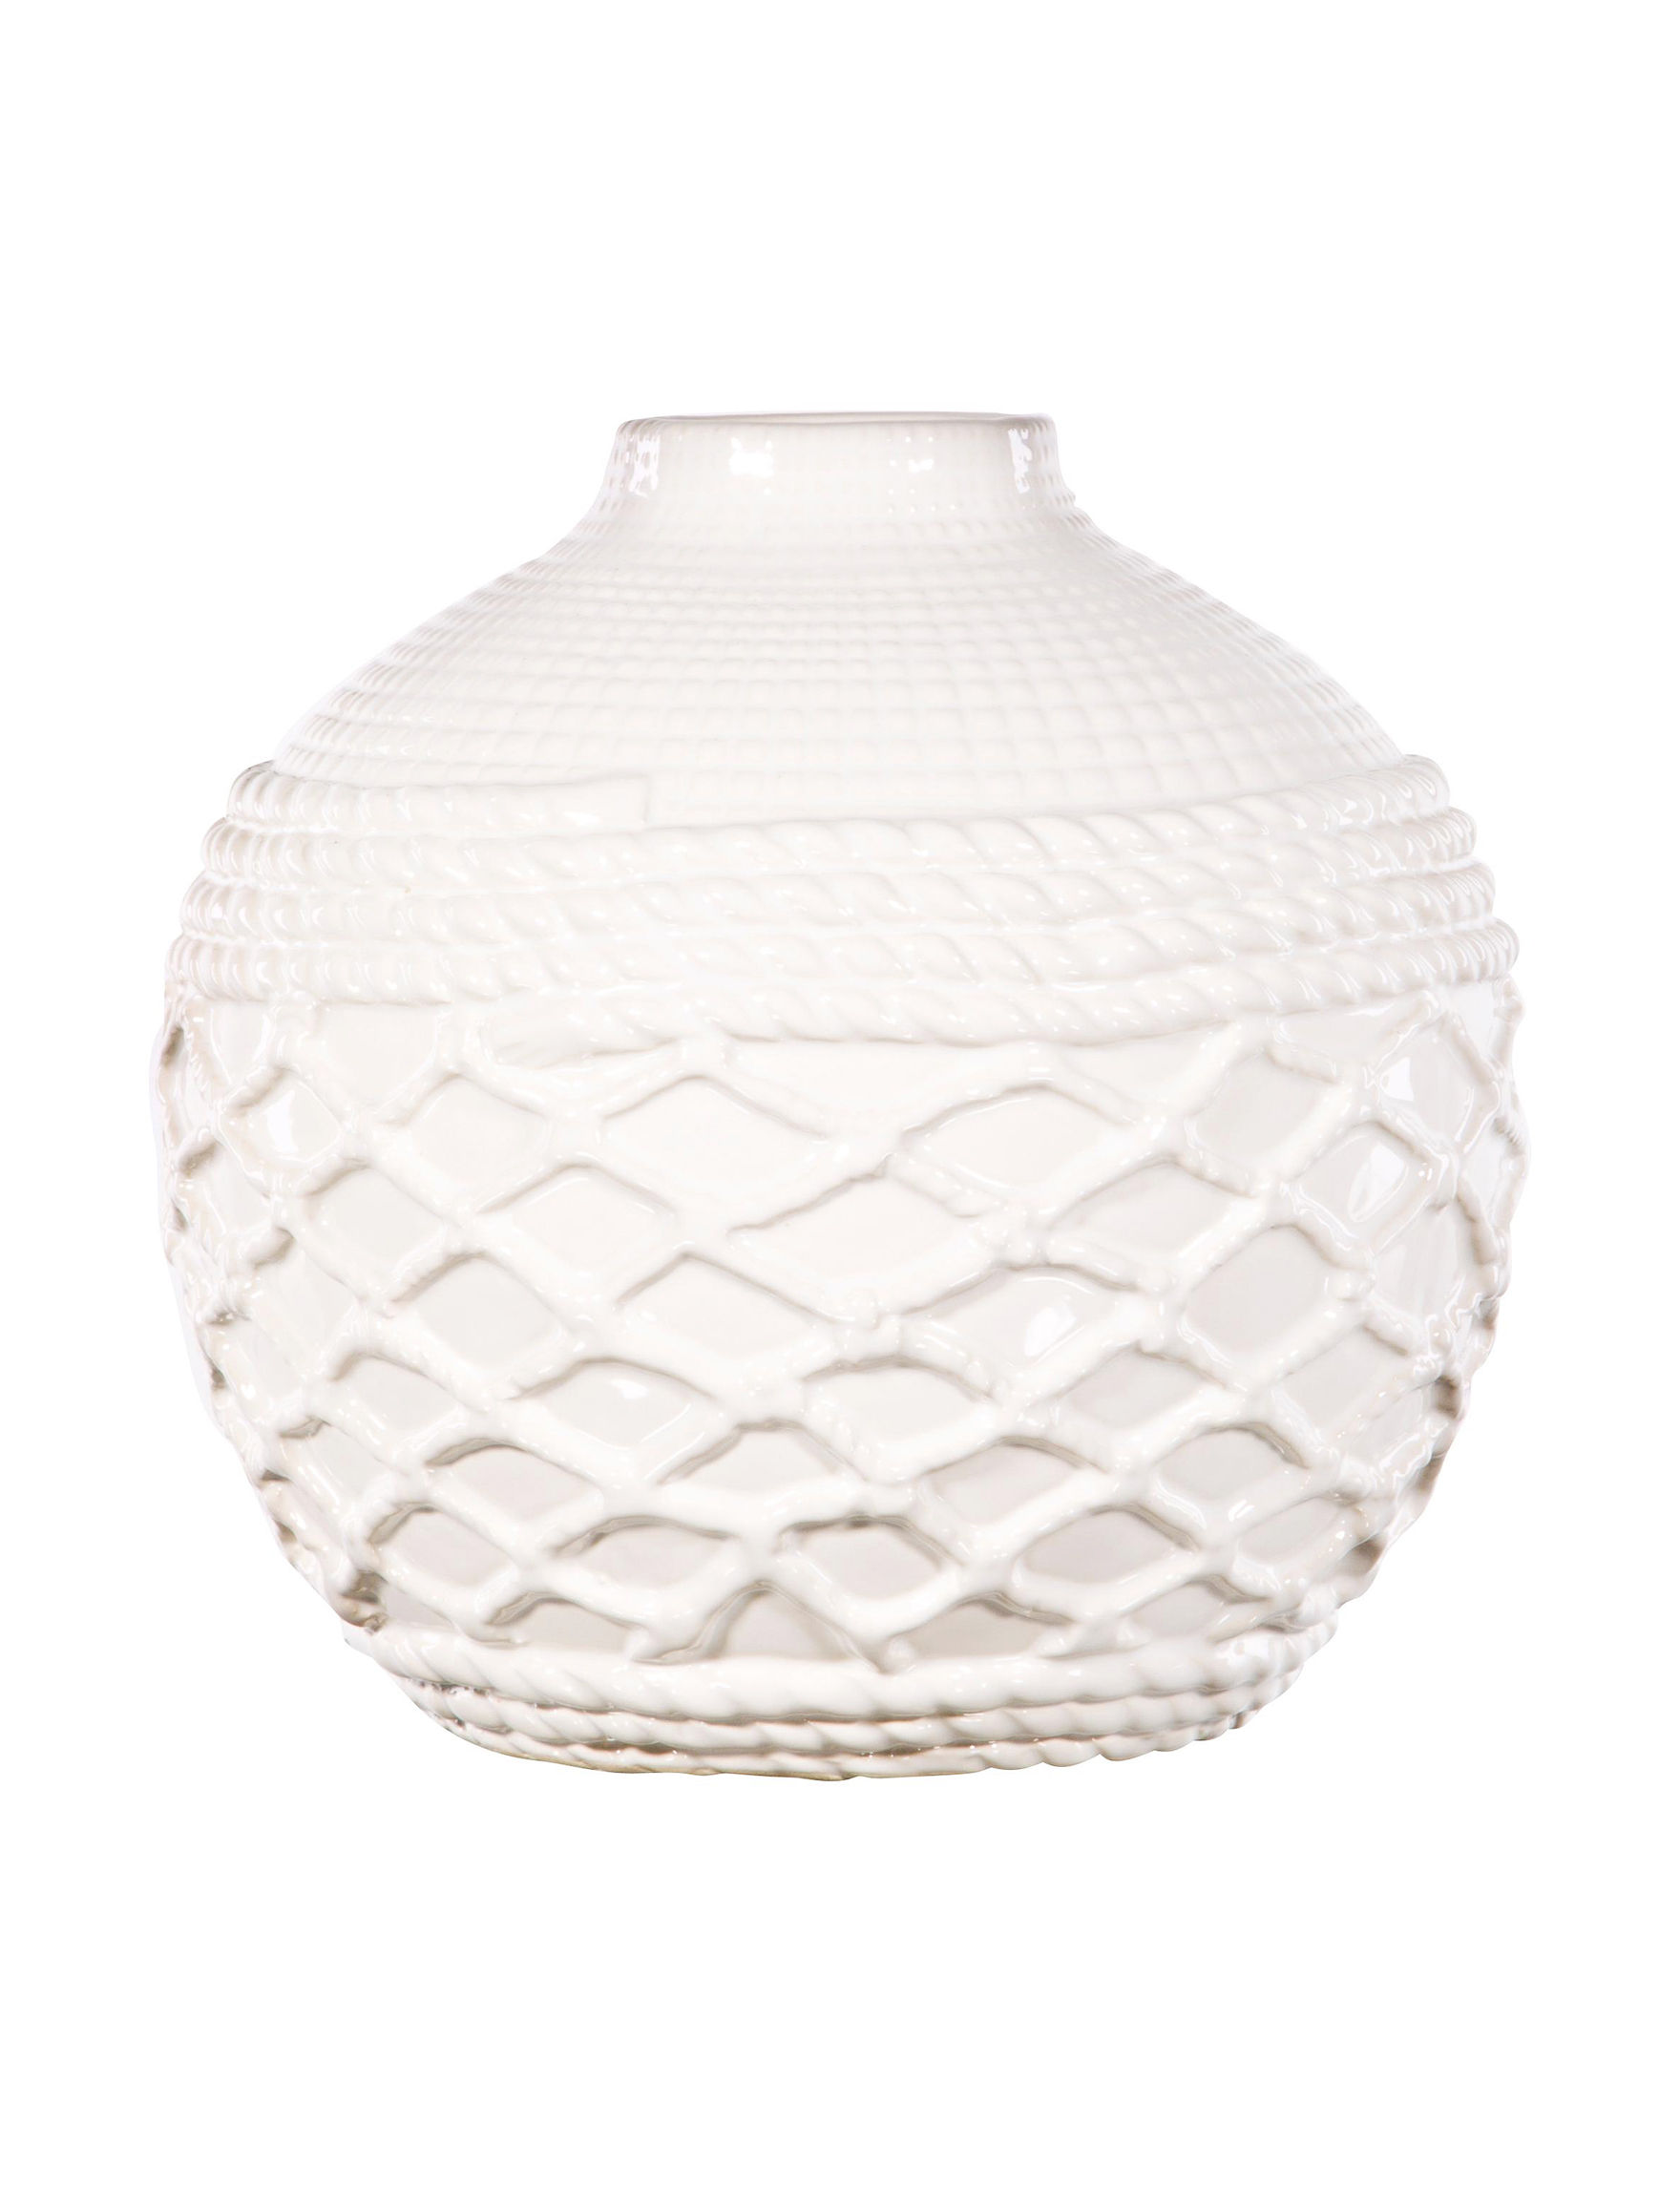 Home Essentials White Vases & Decorative Bowls Home Accents